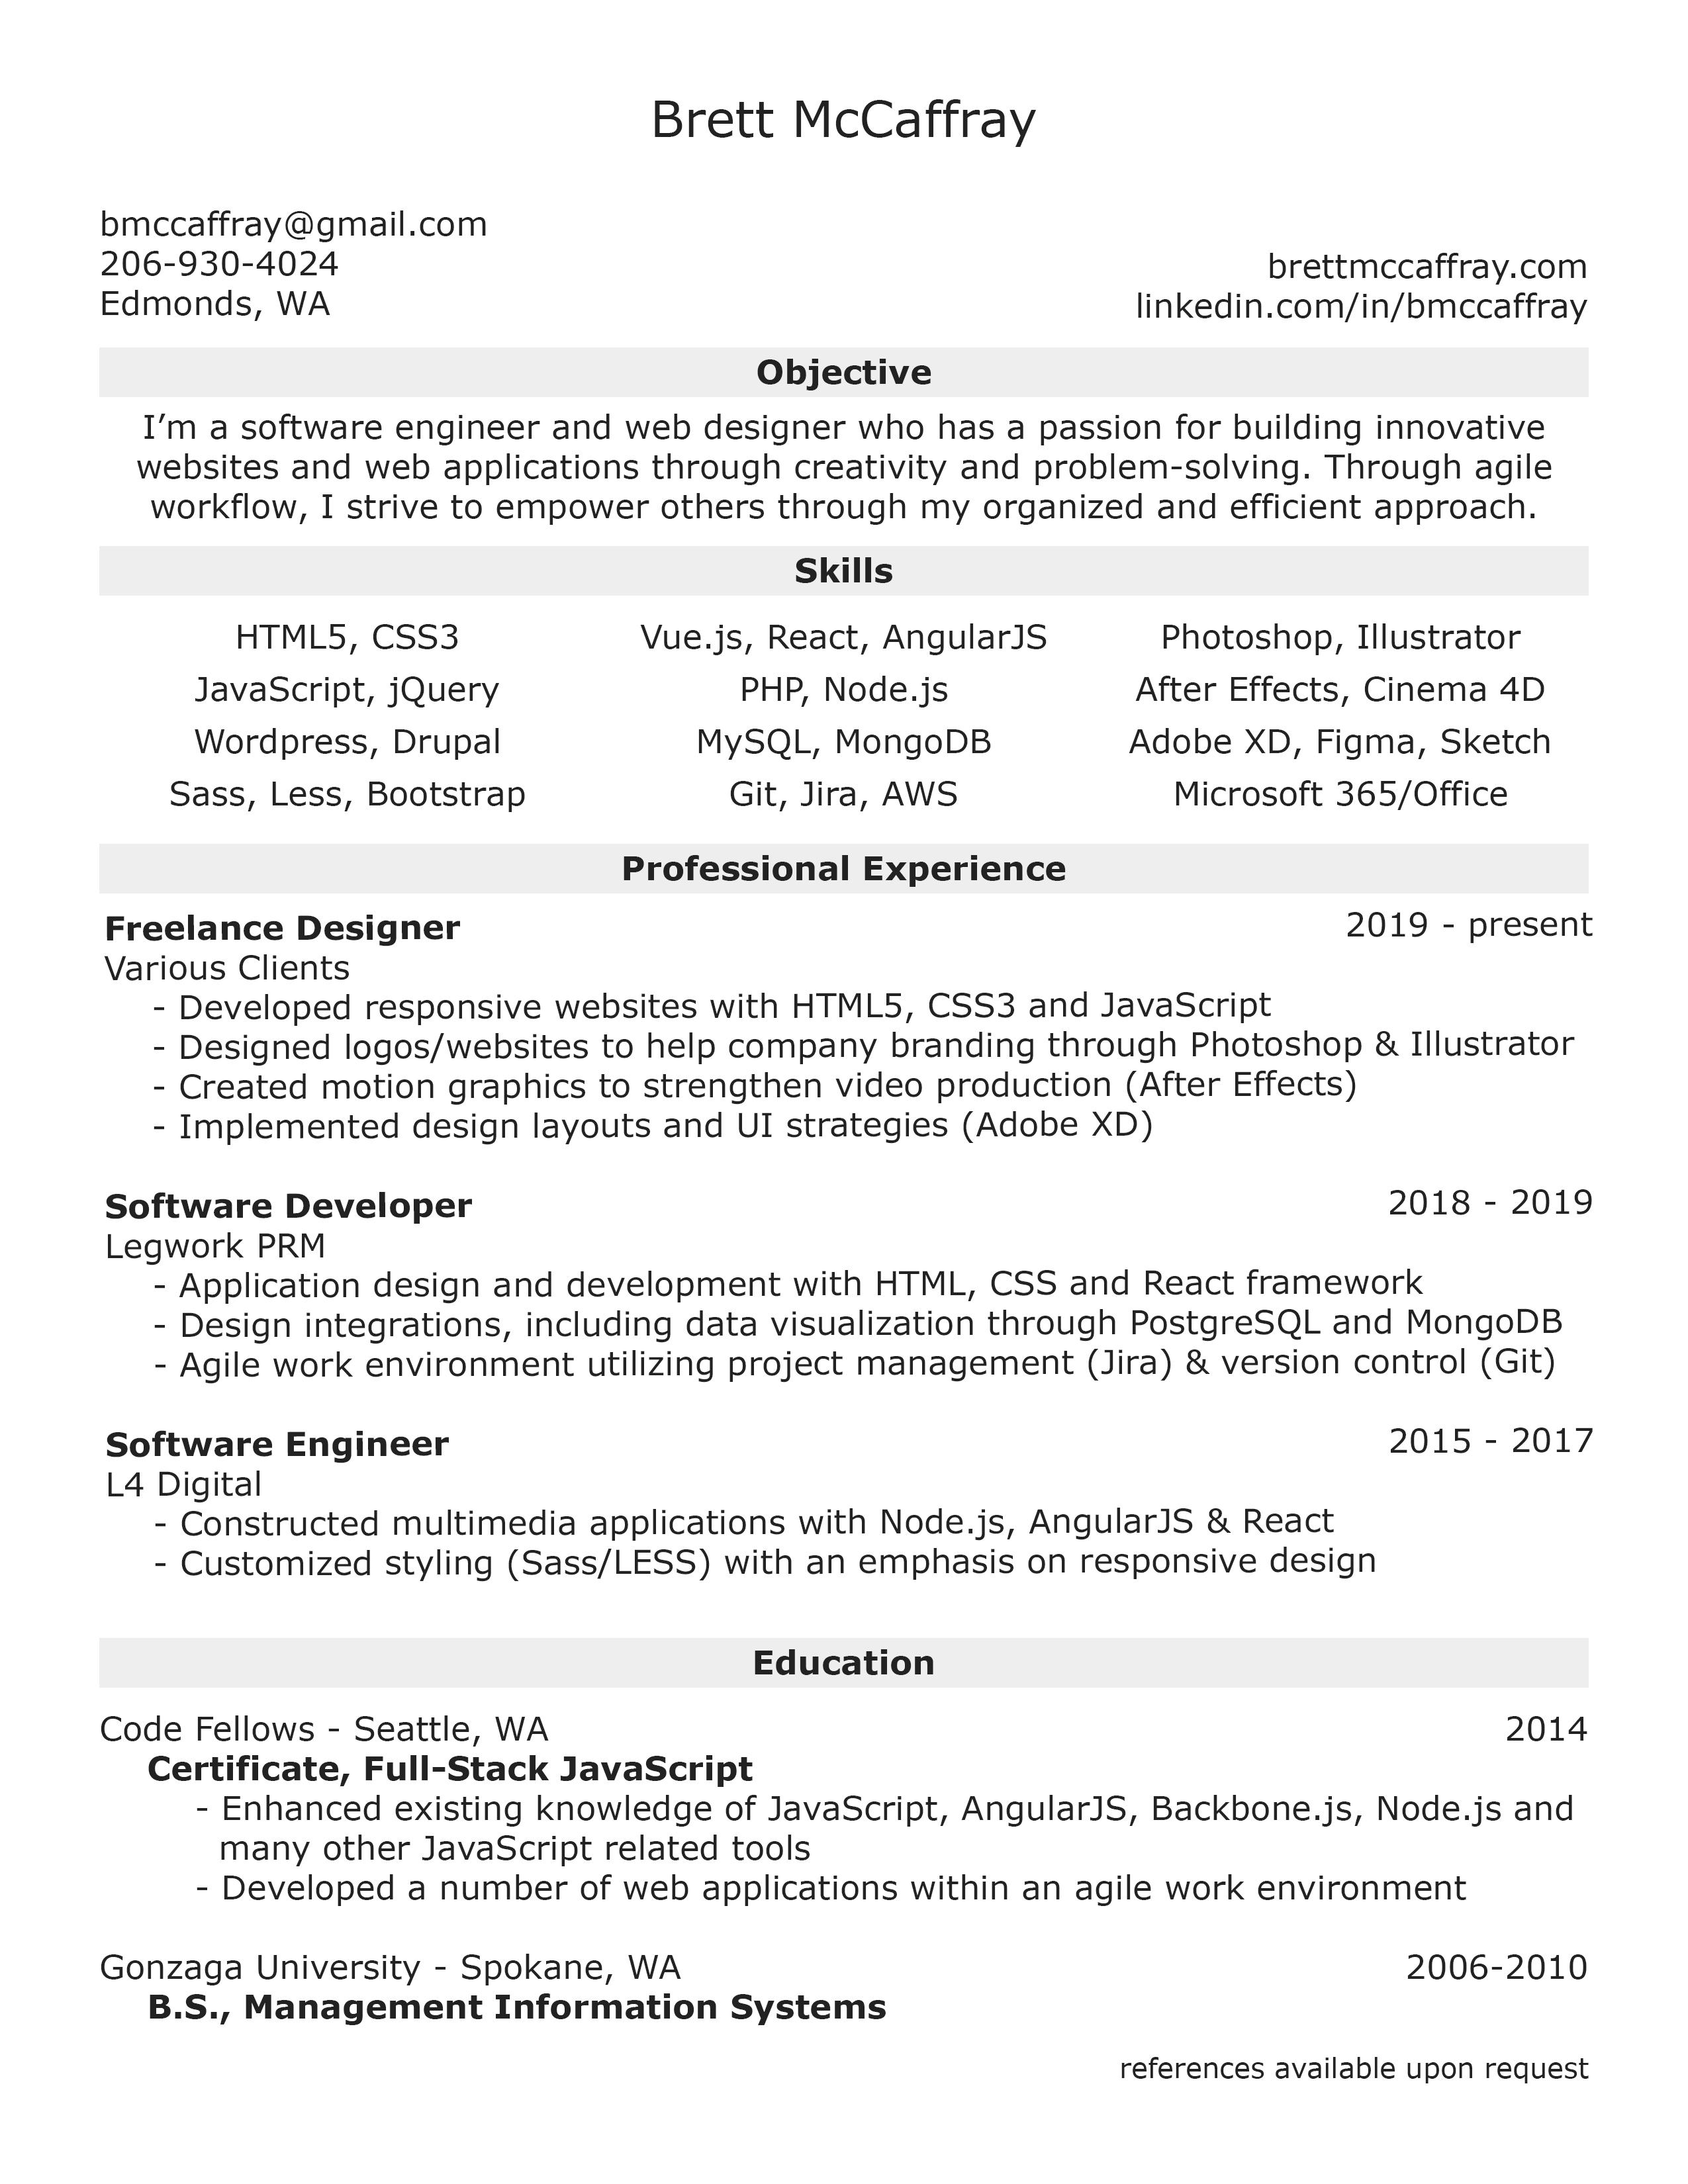 (click To Enlarge) Brett McCaffray Resume  Angularjs Resume